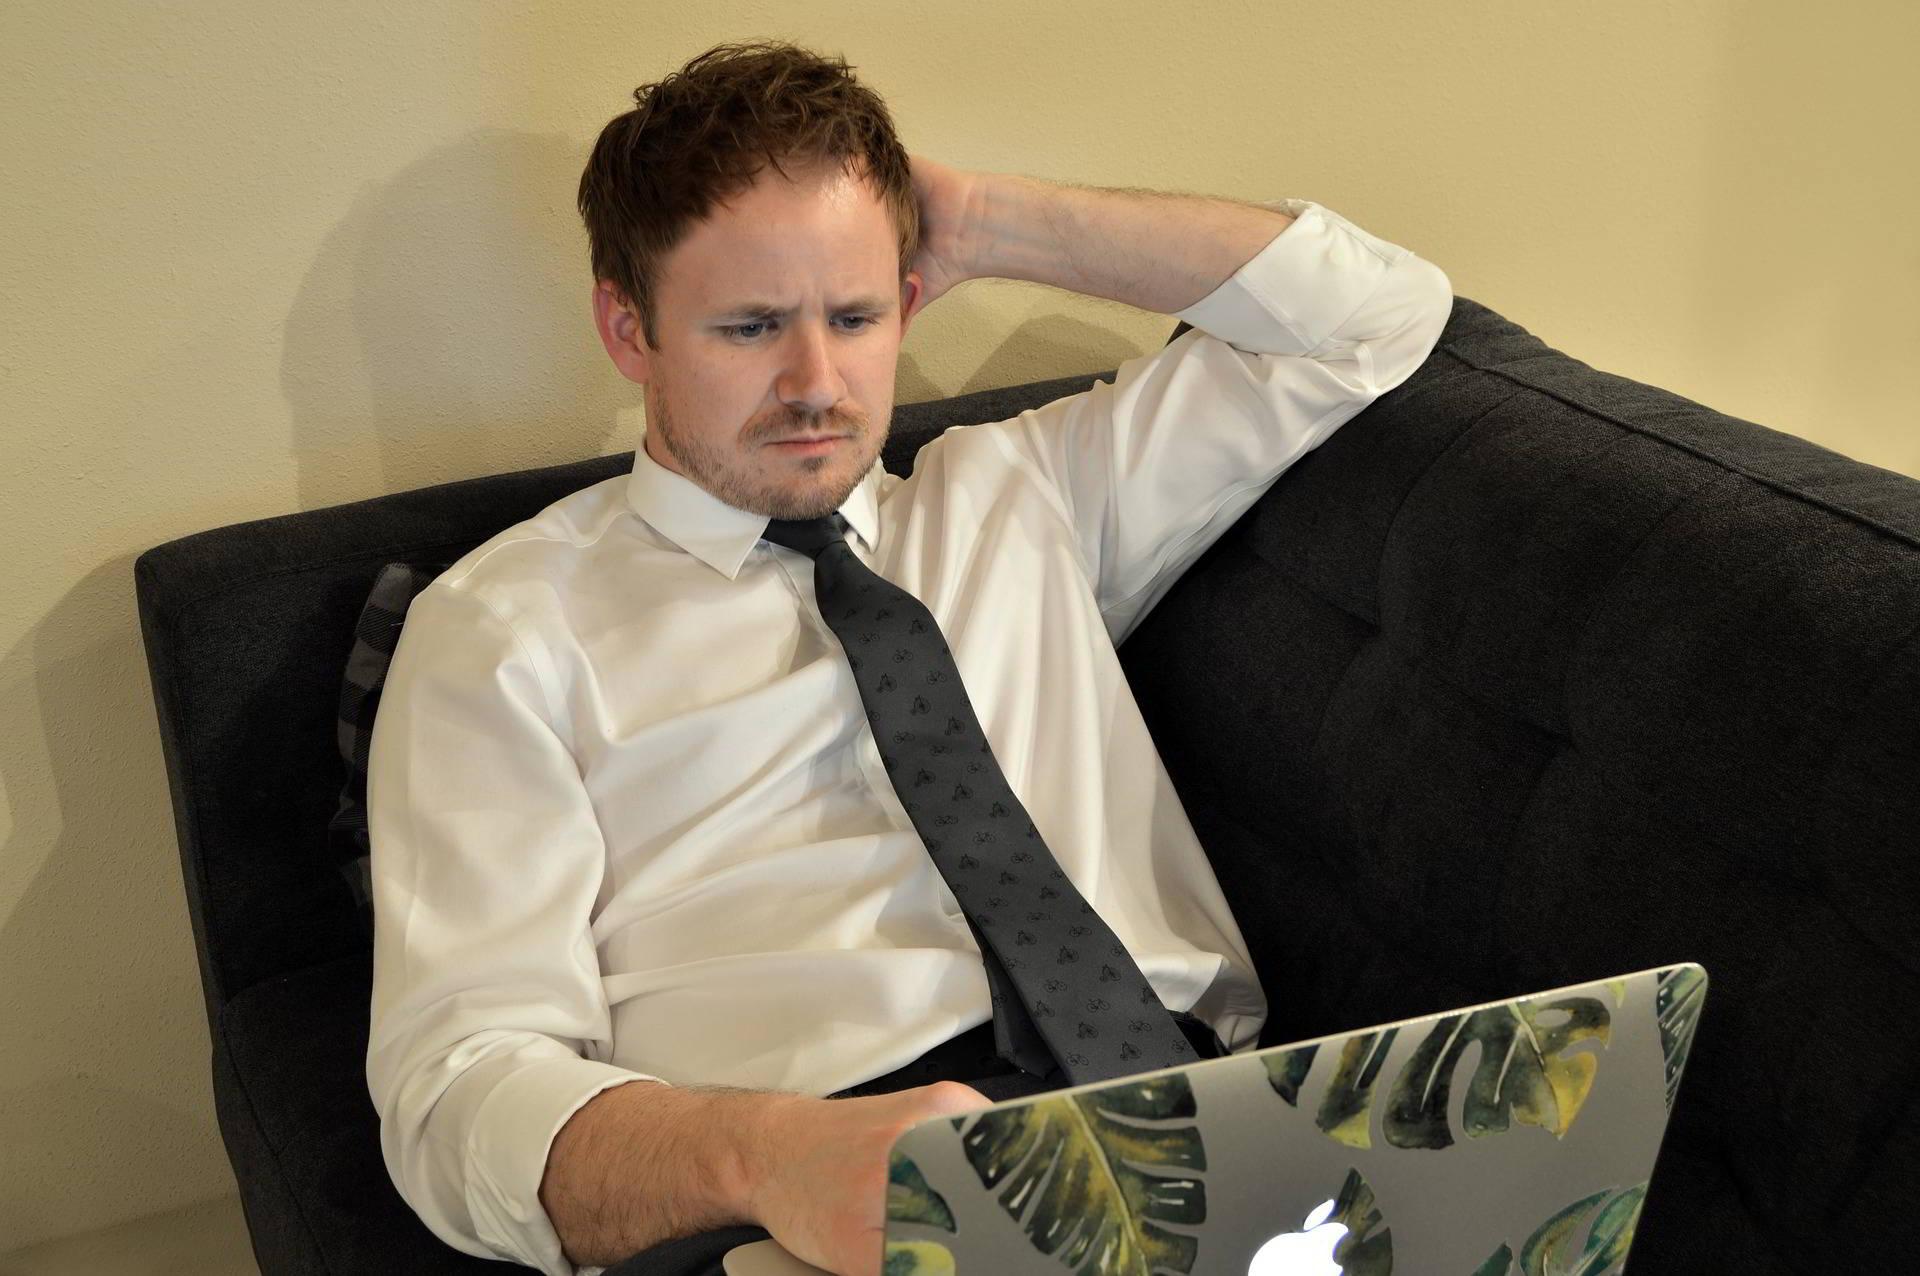 Férfi laptoppal otthon